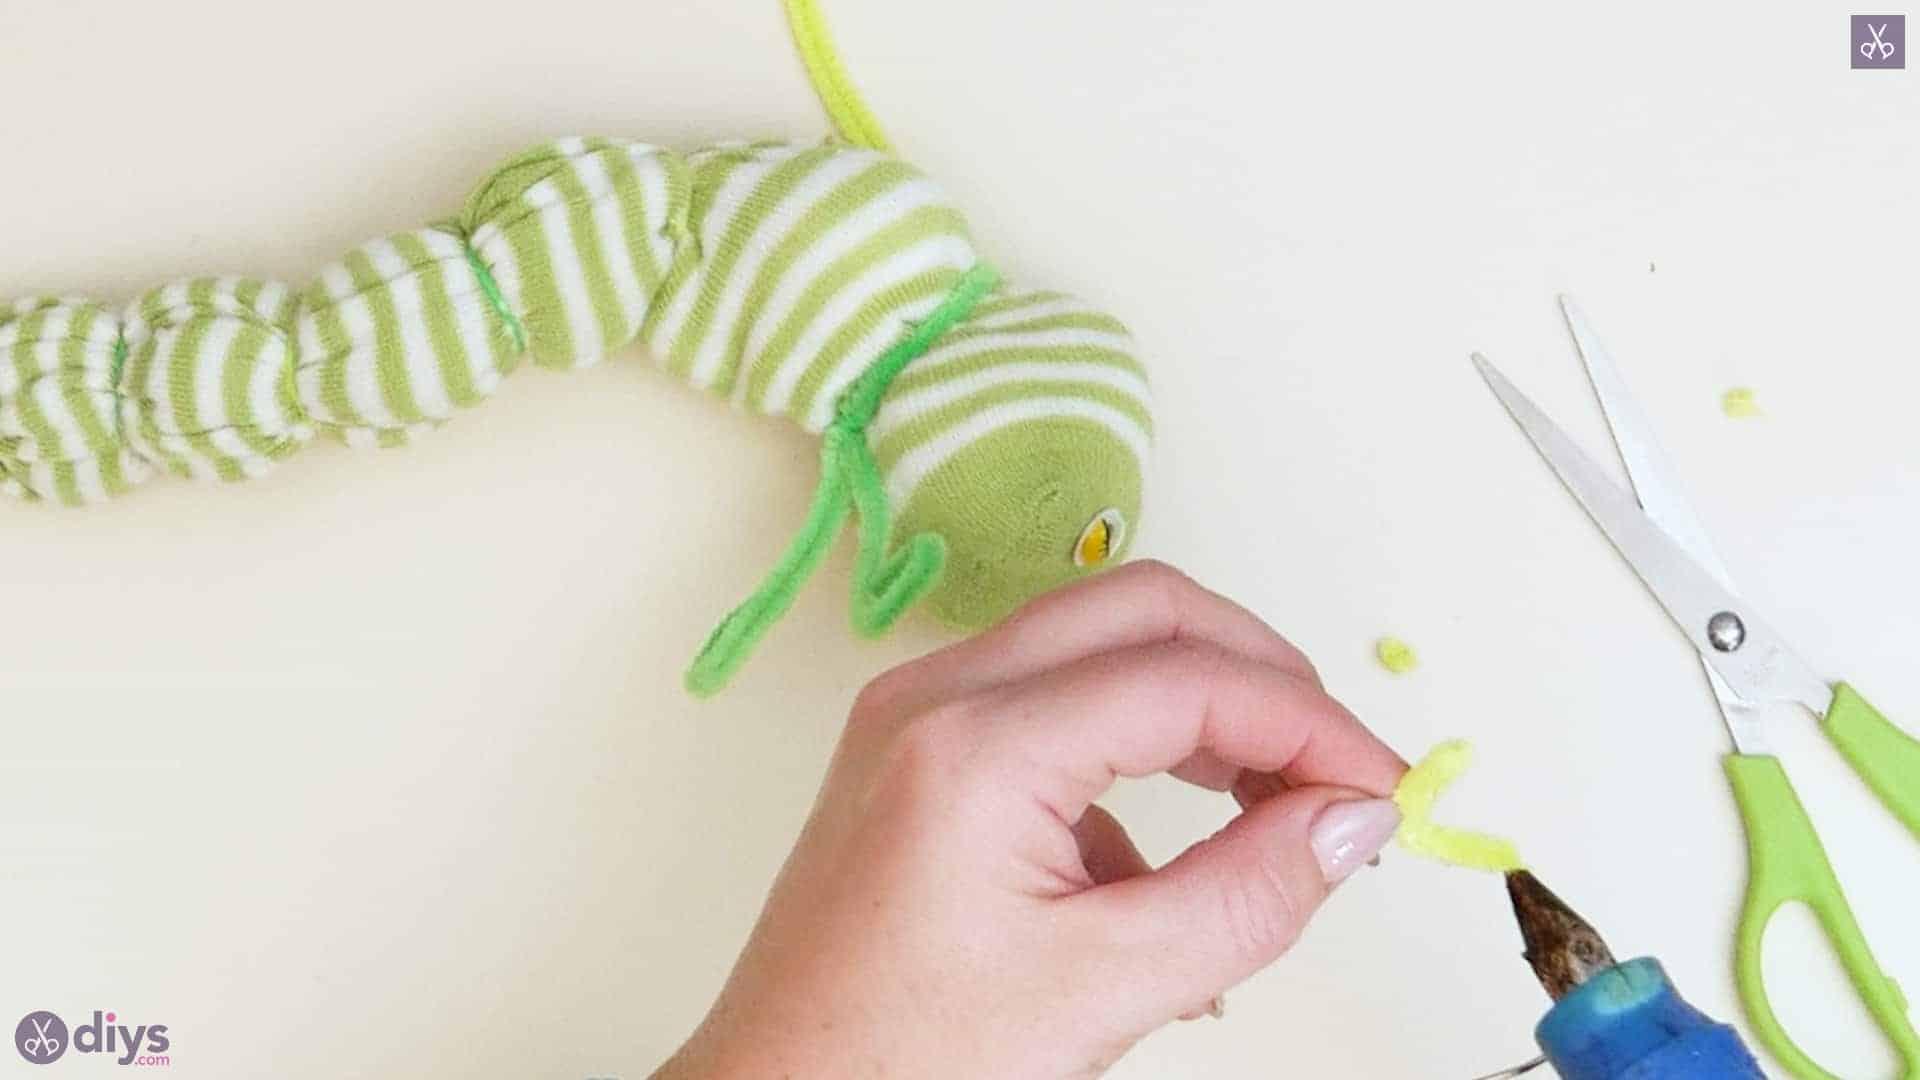 Diy no sew sock worm step 8a